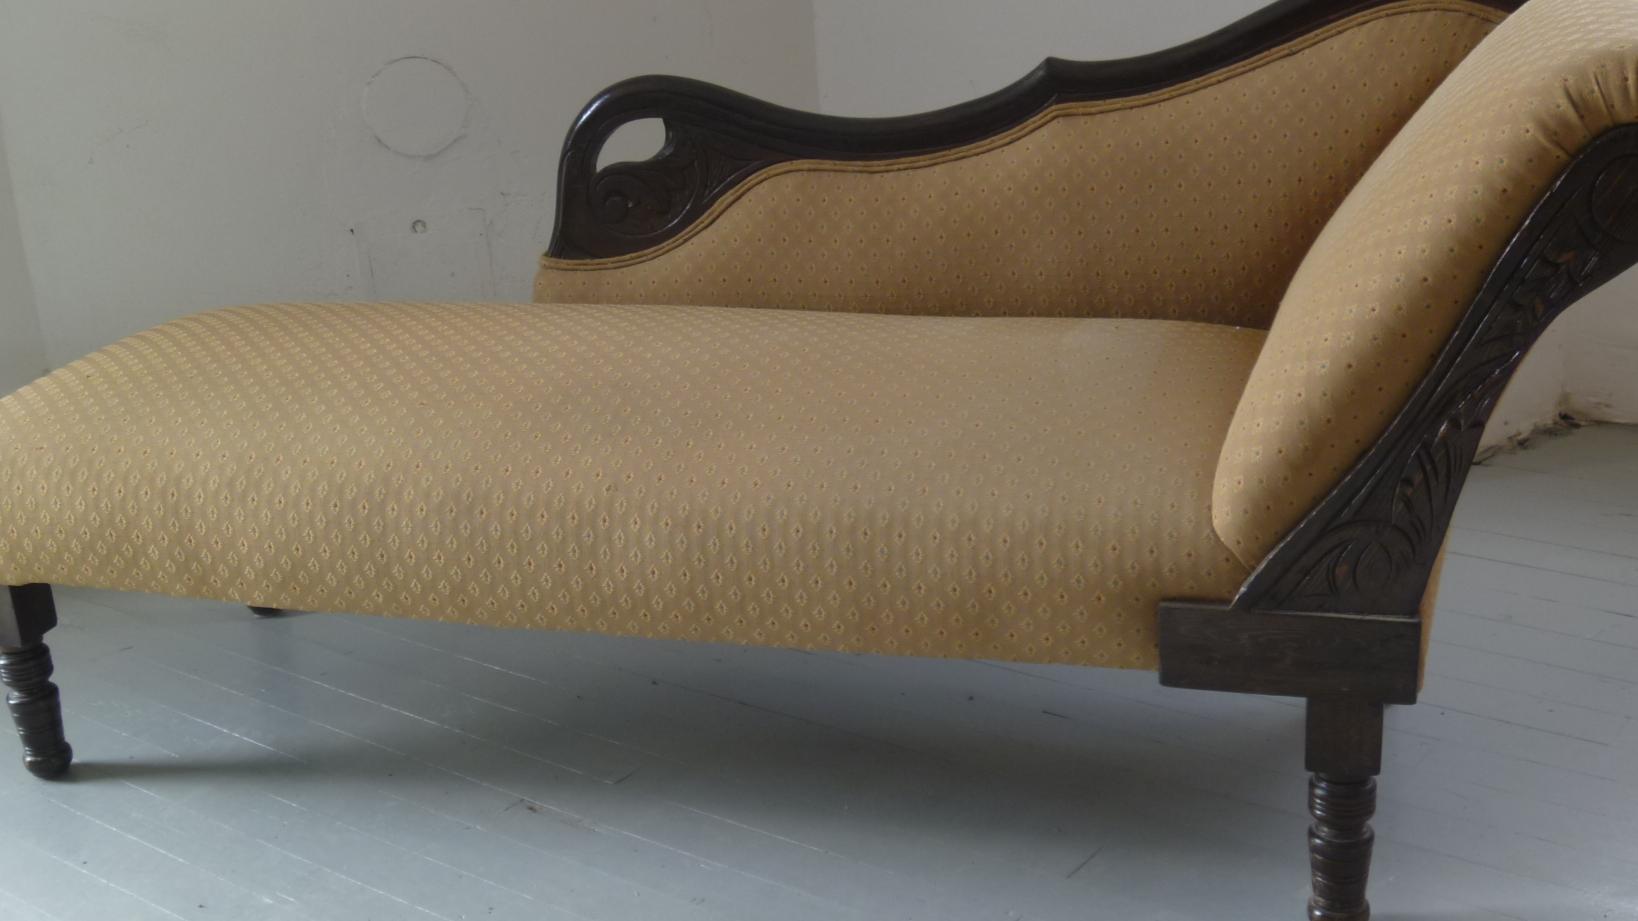 chaise longue armoire 3 door home garden classifieds poitou charentes angloinfo. Black Bedroom Furniture Sets. Home Design Ideas